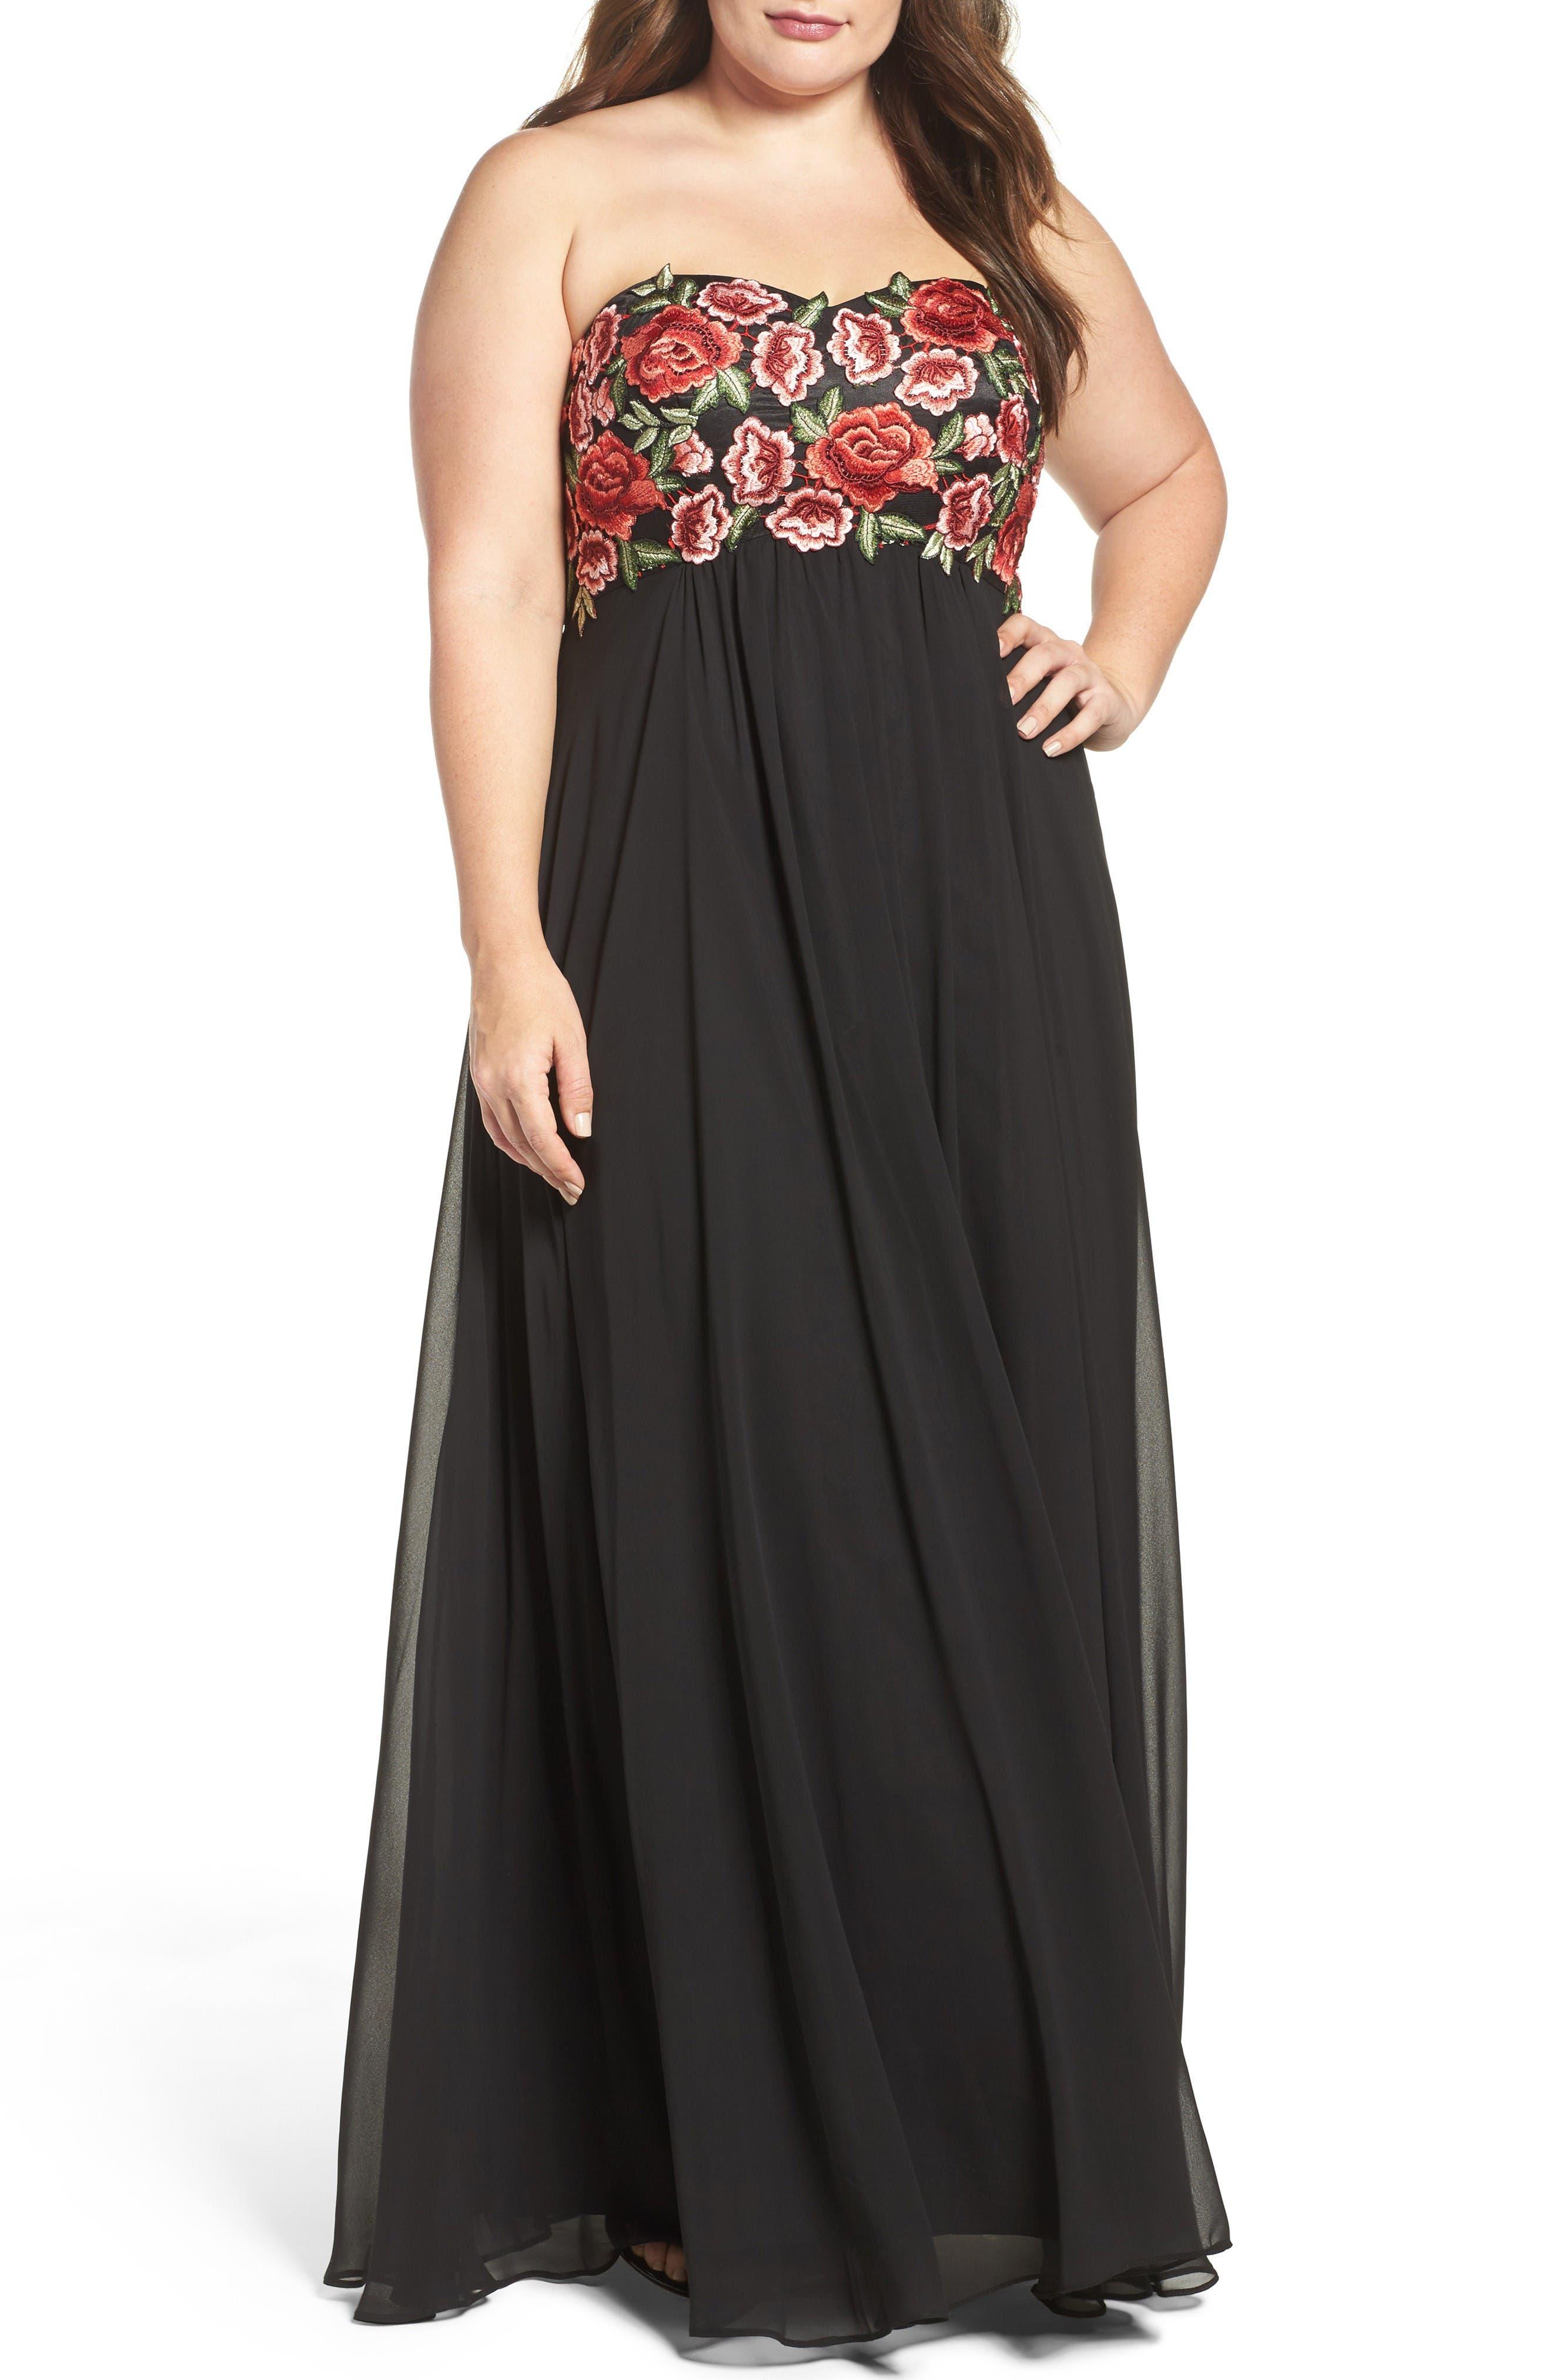 Floral Appliqué Strapless Gown,                             Main thumbnail 1, color,                             Black/ Red